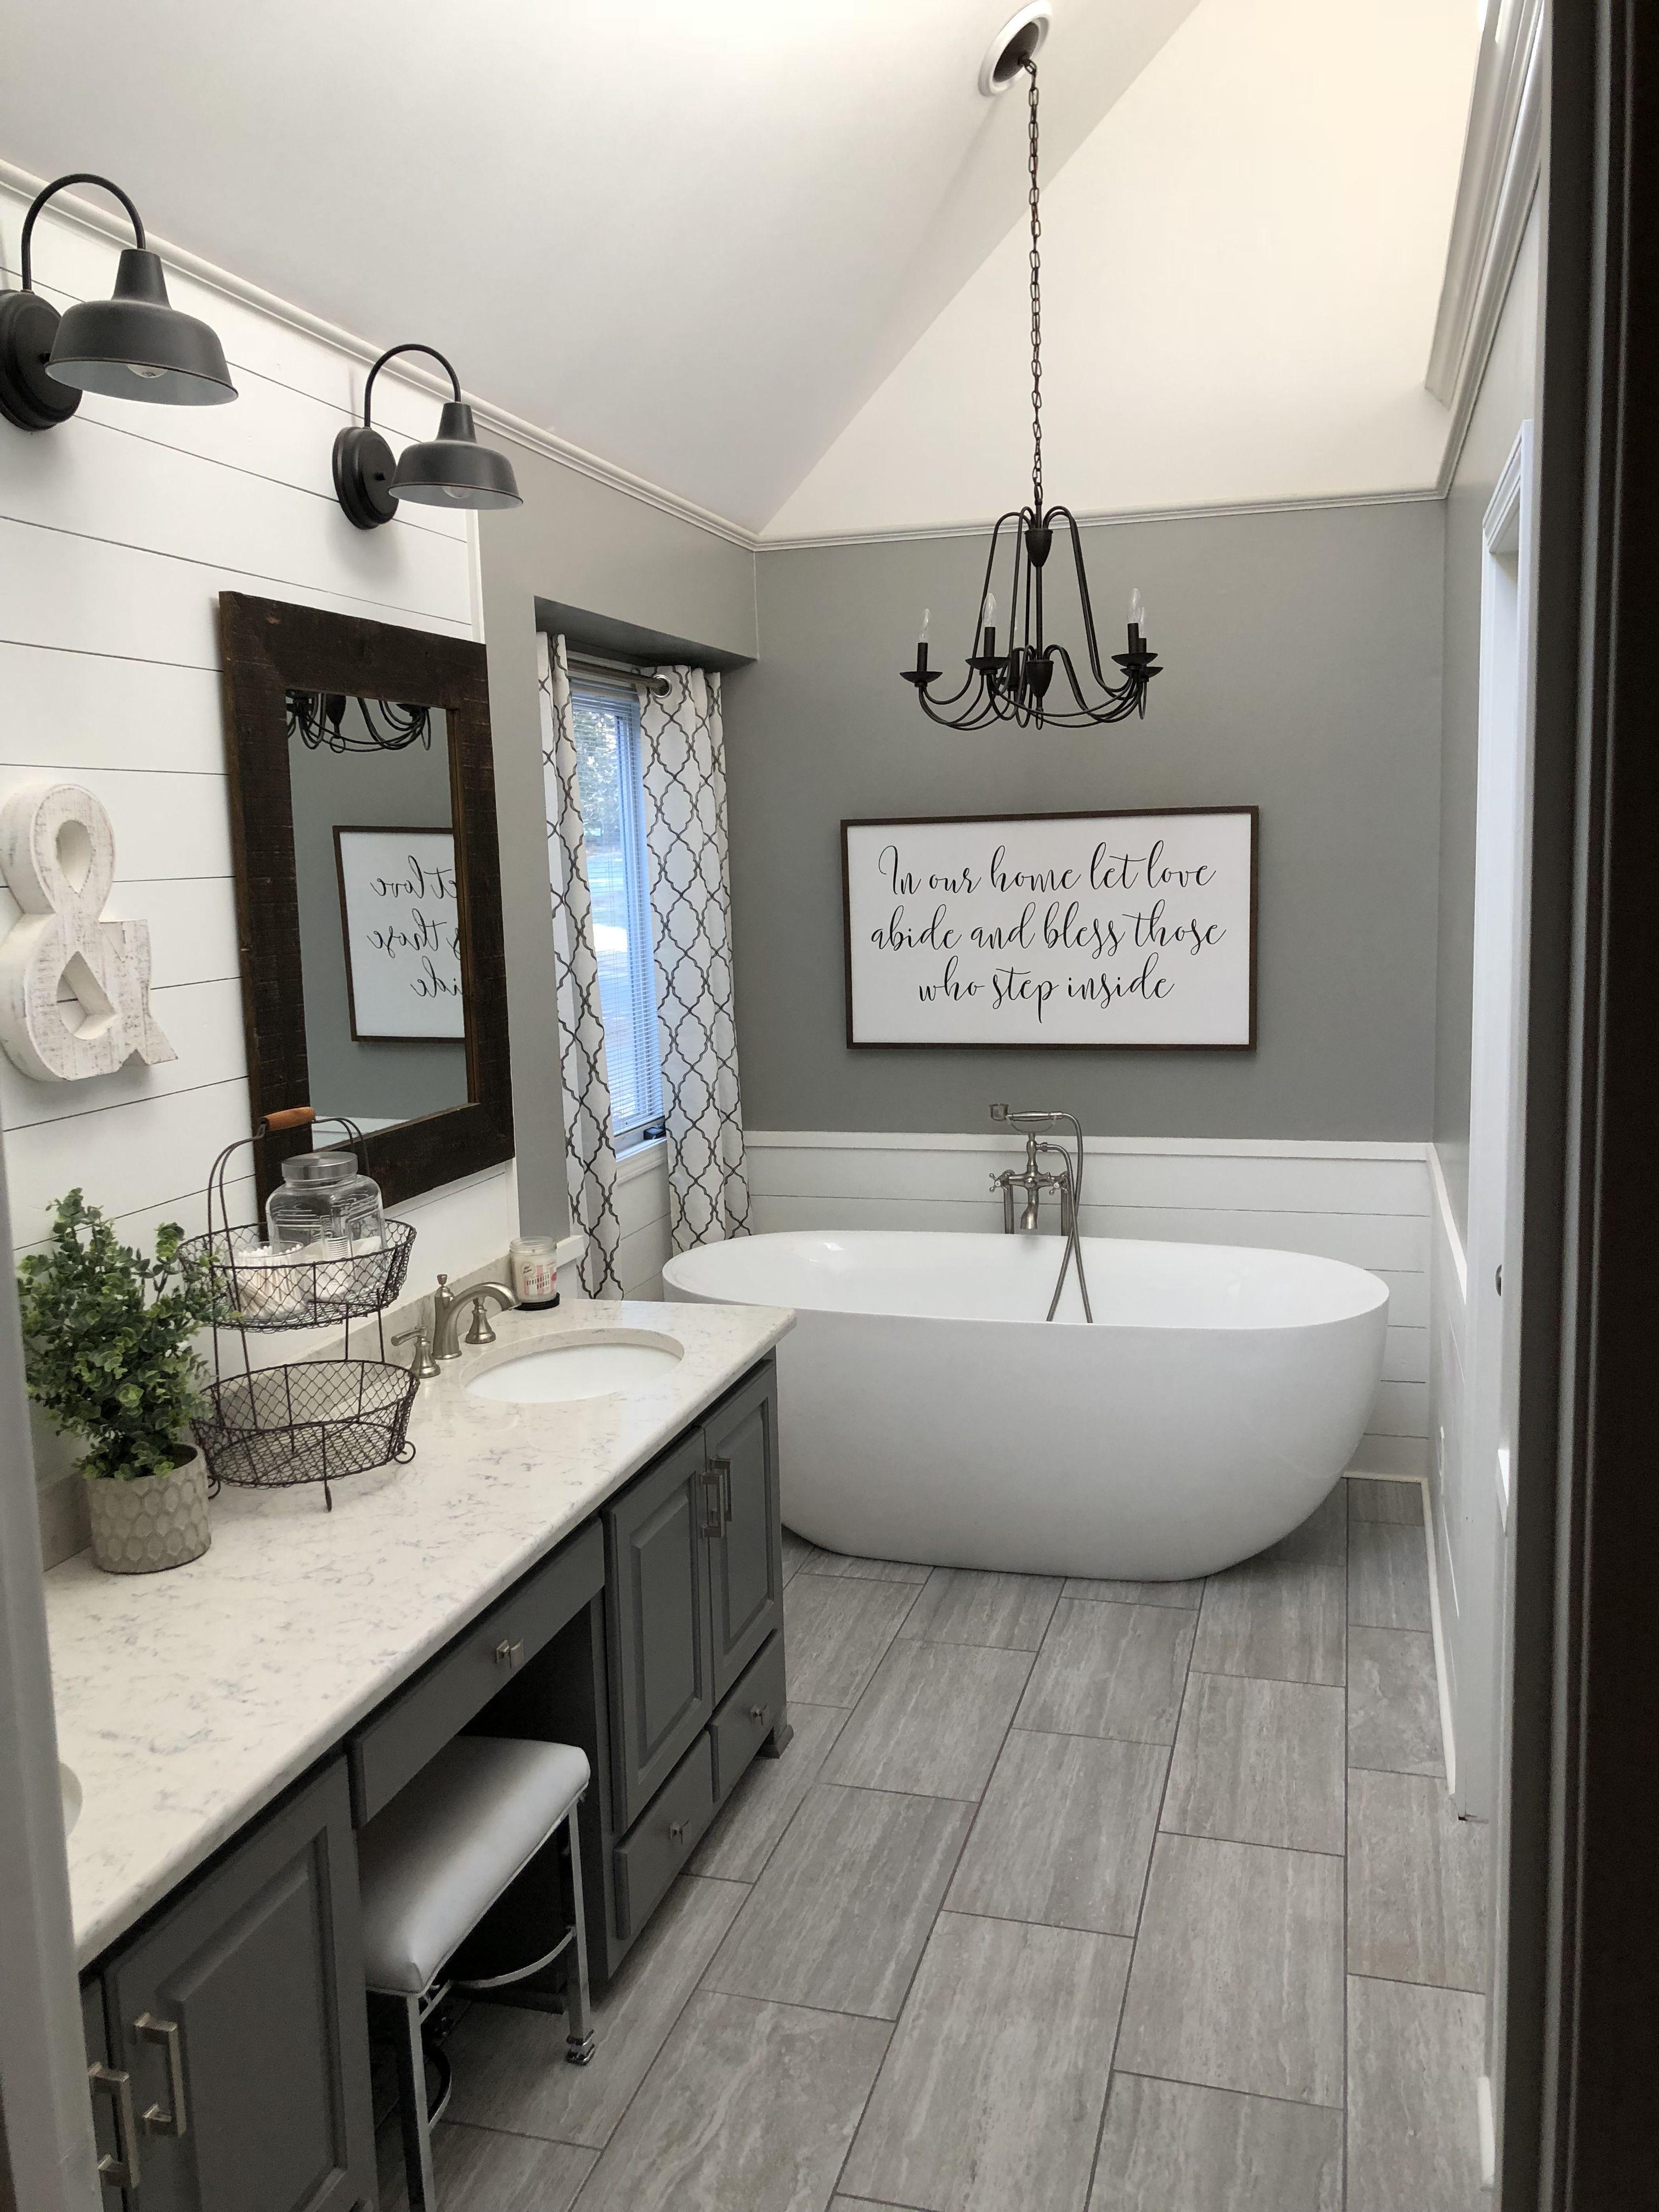 Master bath farmhouse style | Farmhouse | Pinterest ...